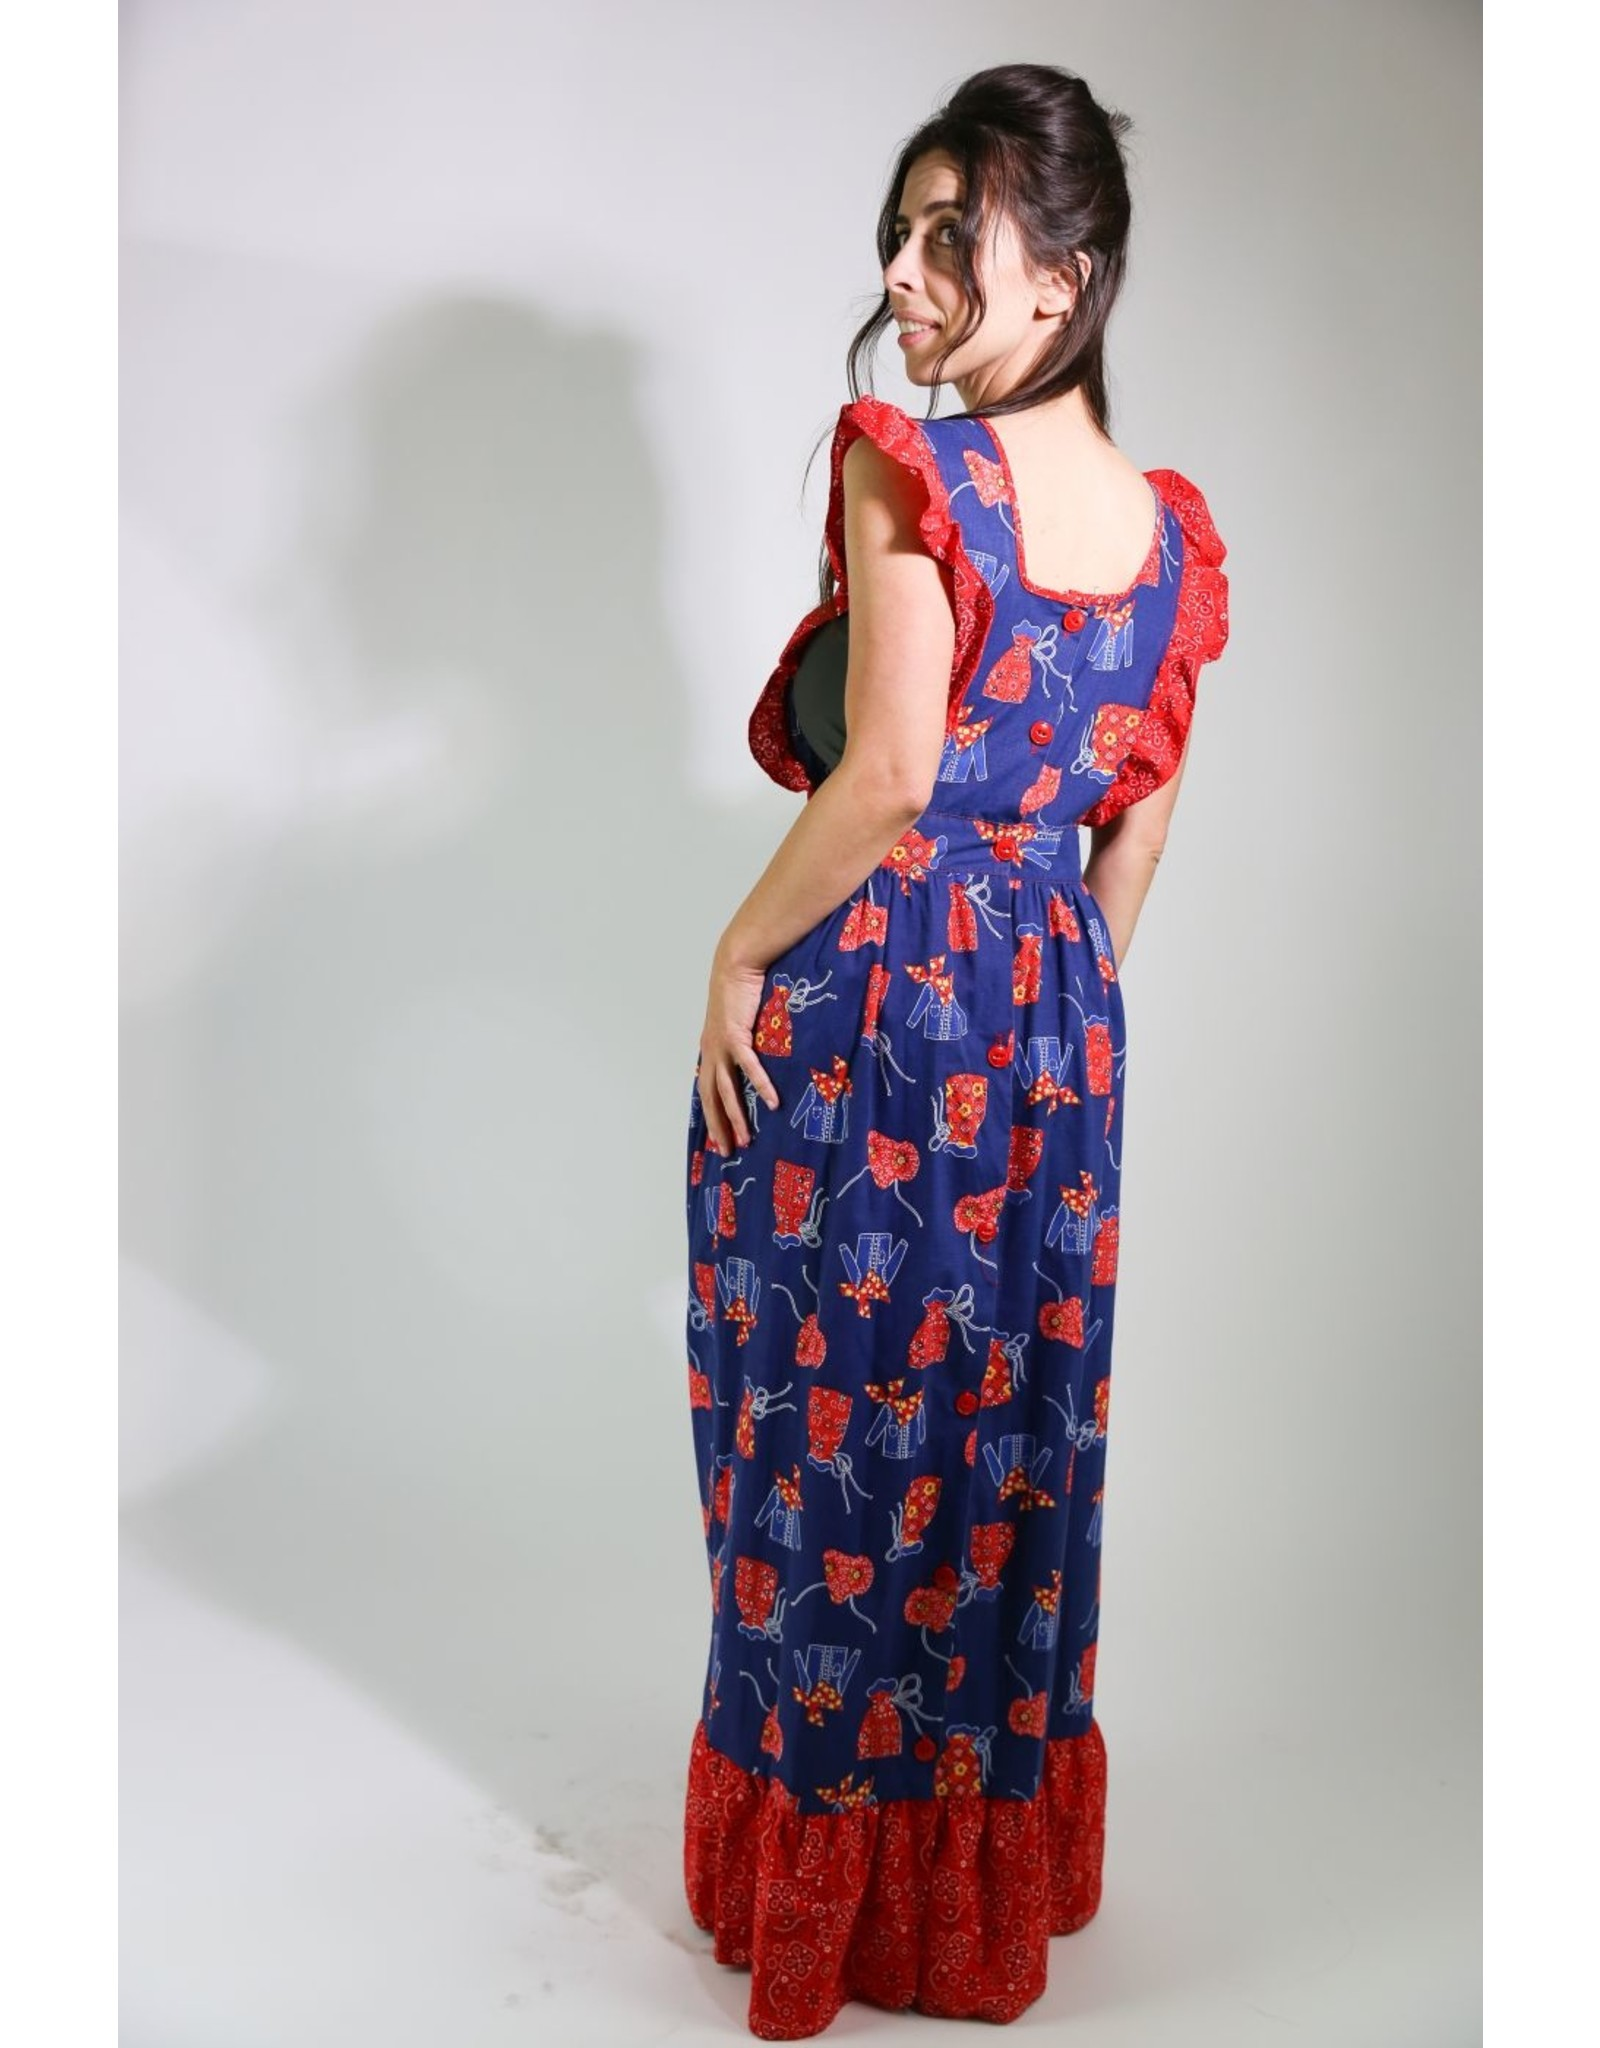 1970's Blue & Red Apron Dress